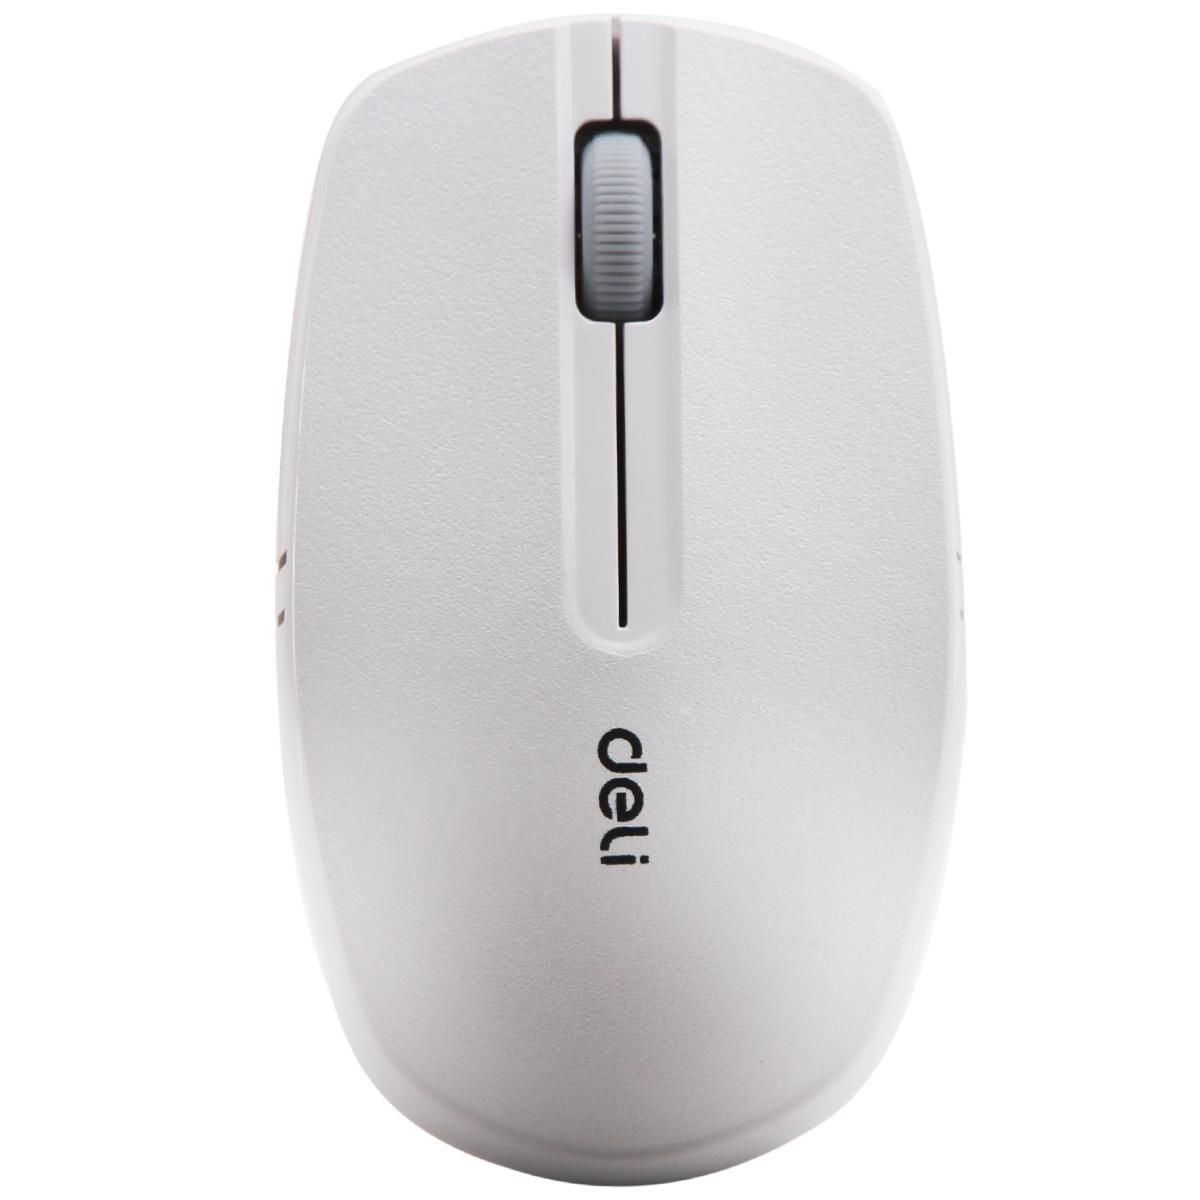 Coussin chauffant USB Deli entreprise - Ref 421613 Image 4